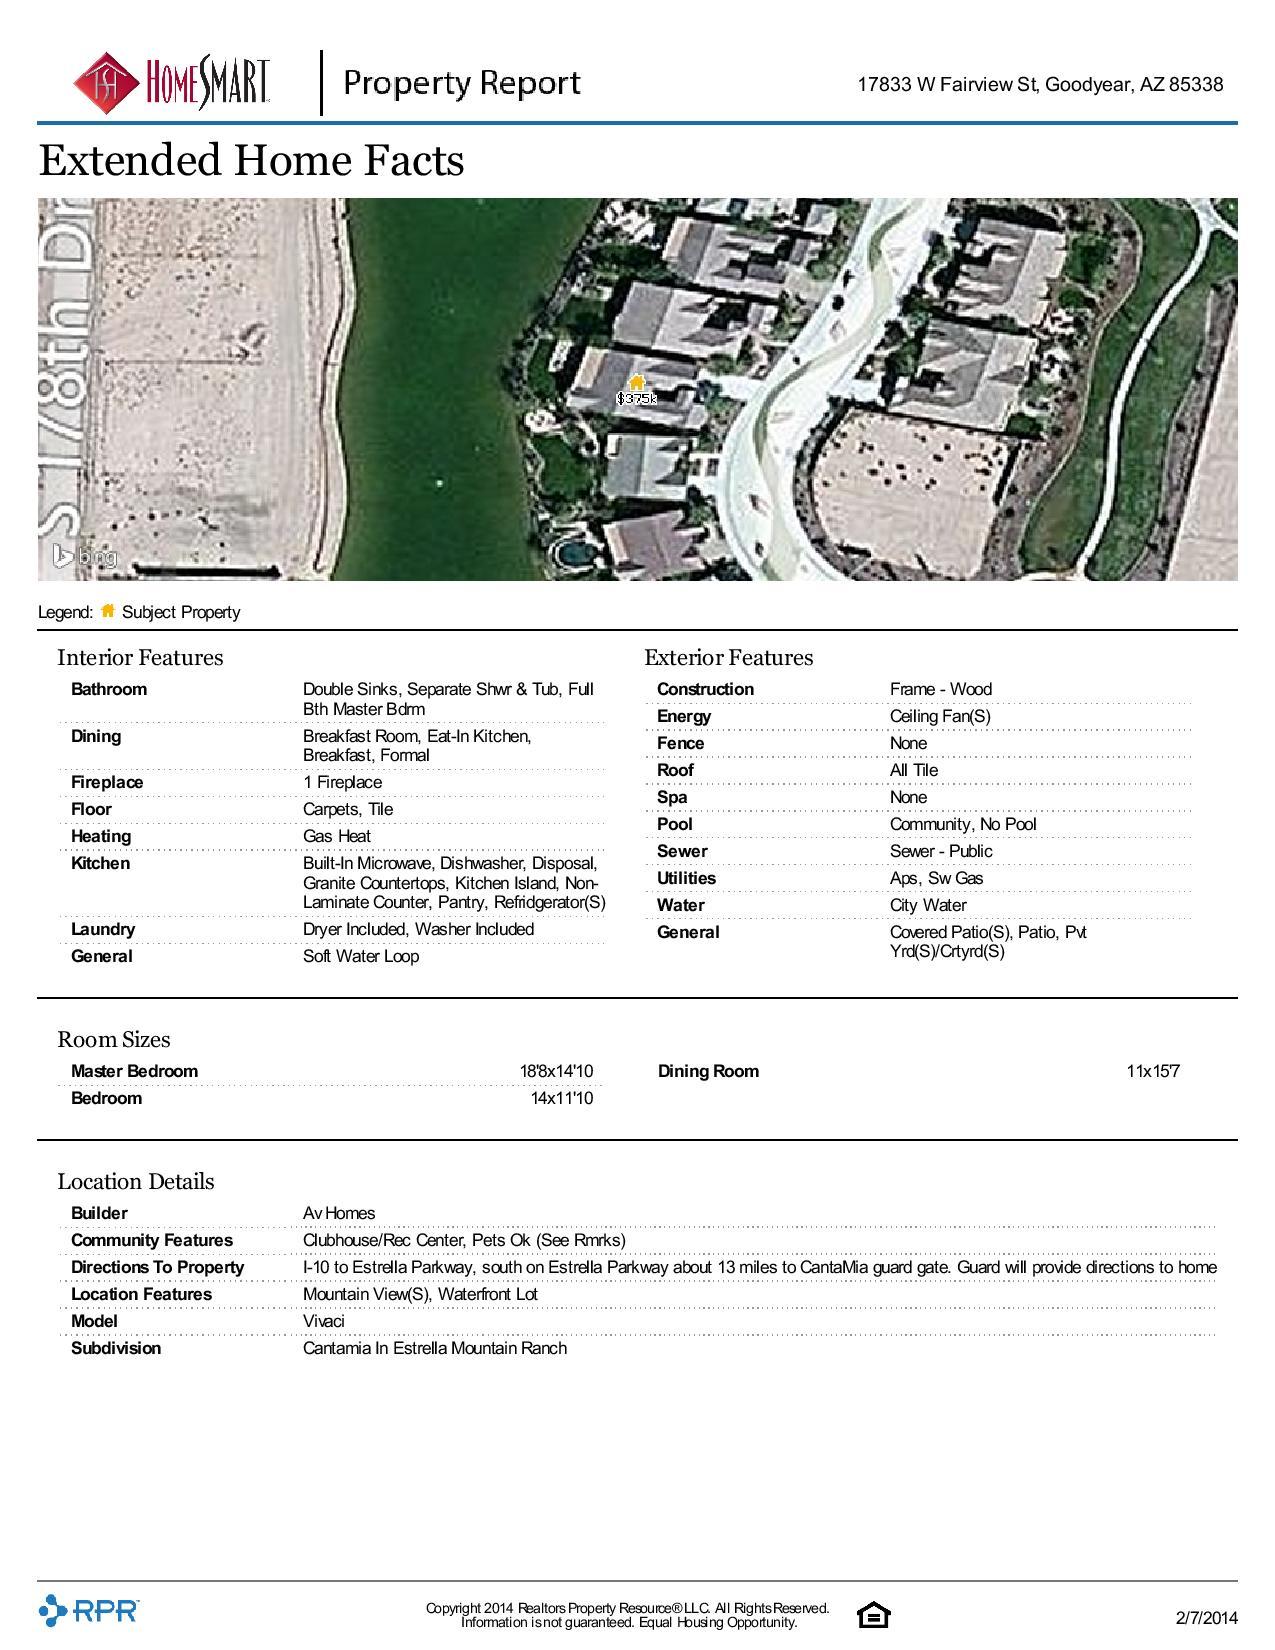 17833-W-Fairview-St-Goodyear-AZ-85338.pdf-page-004